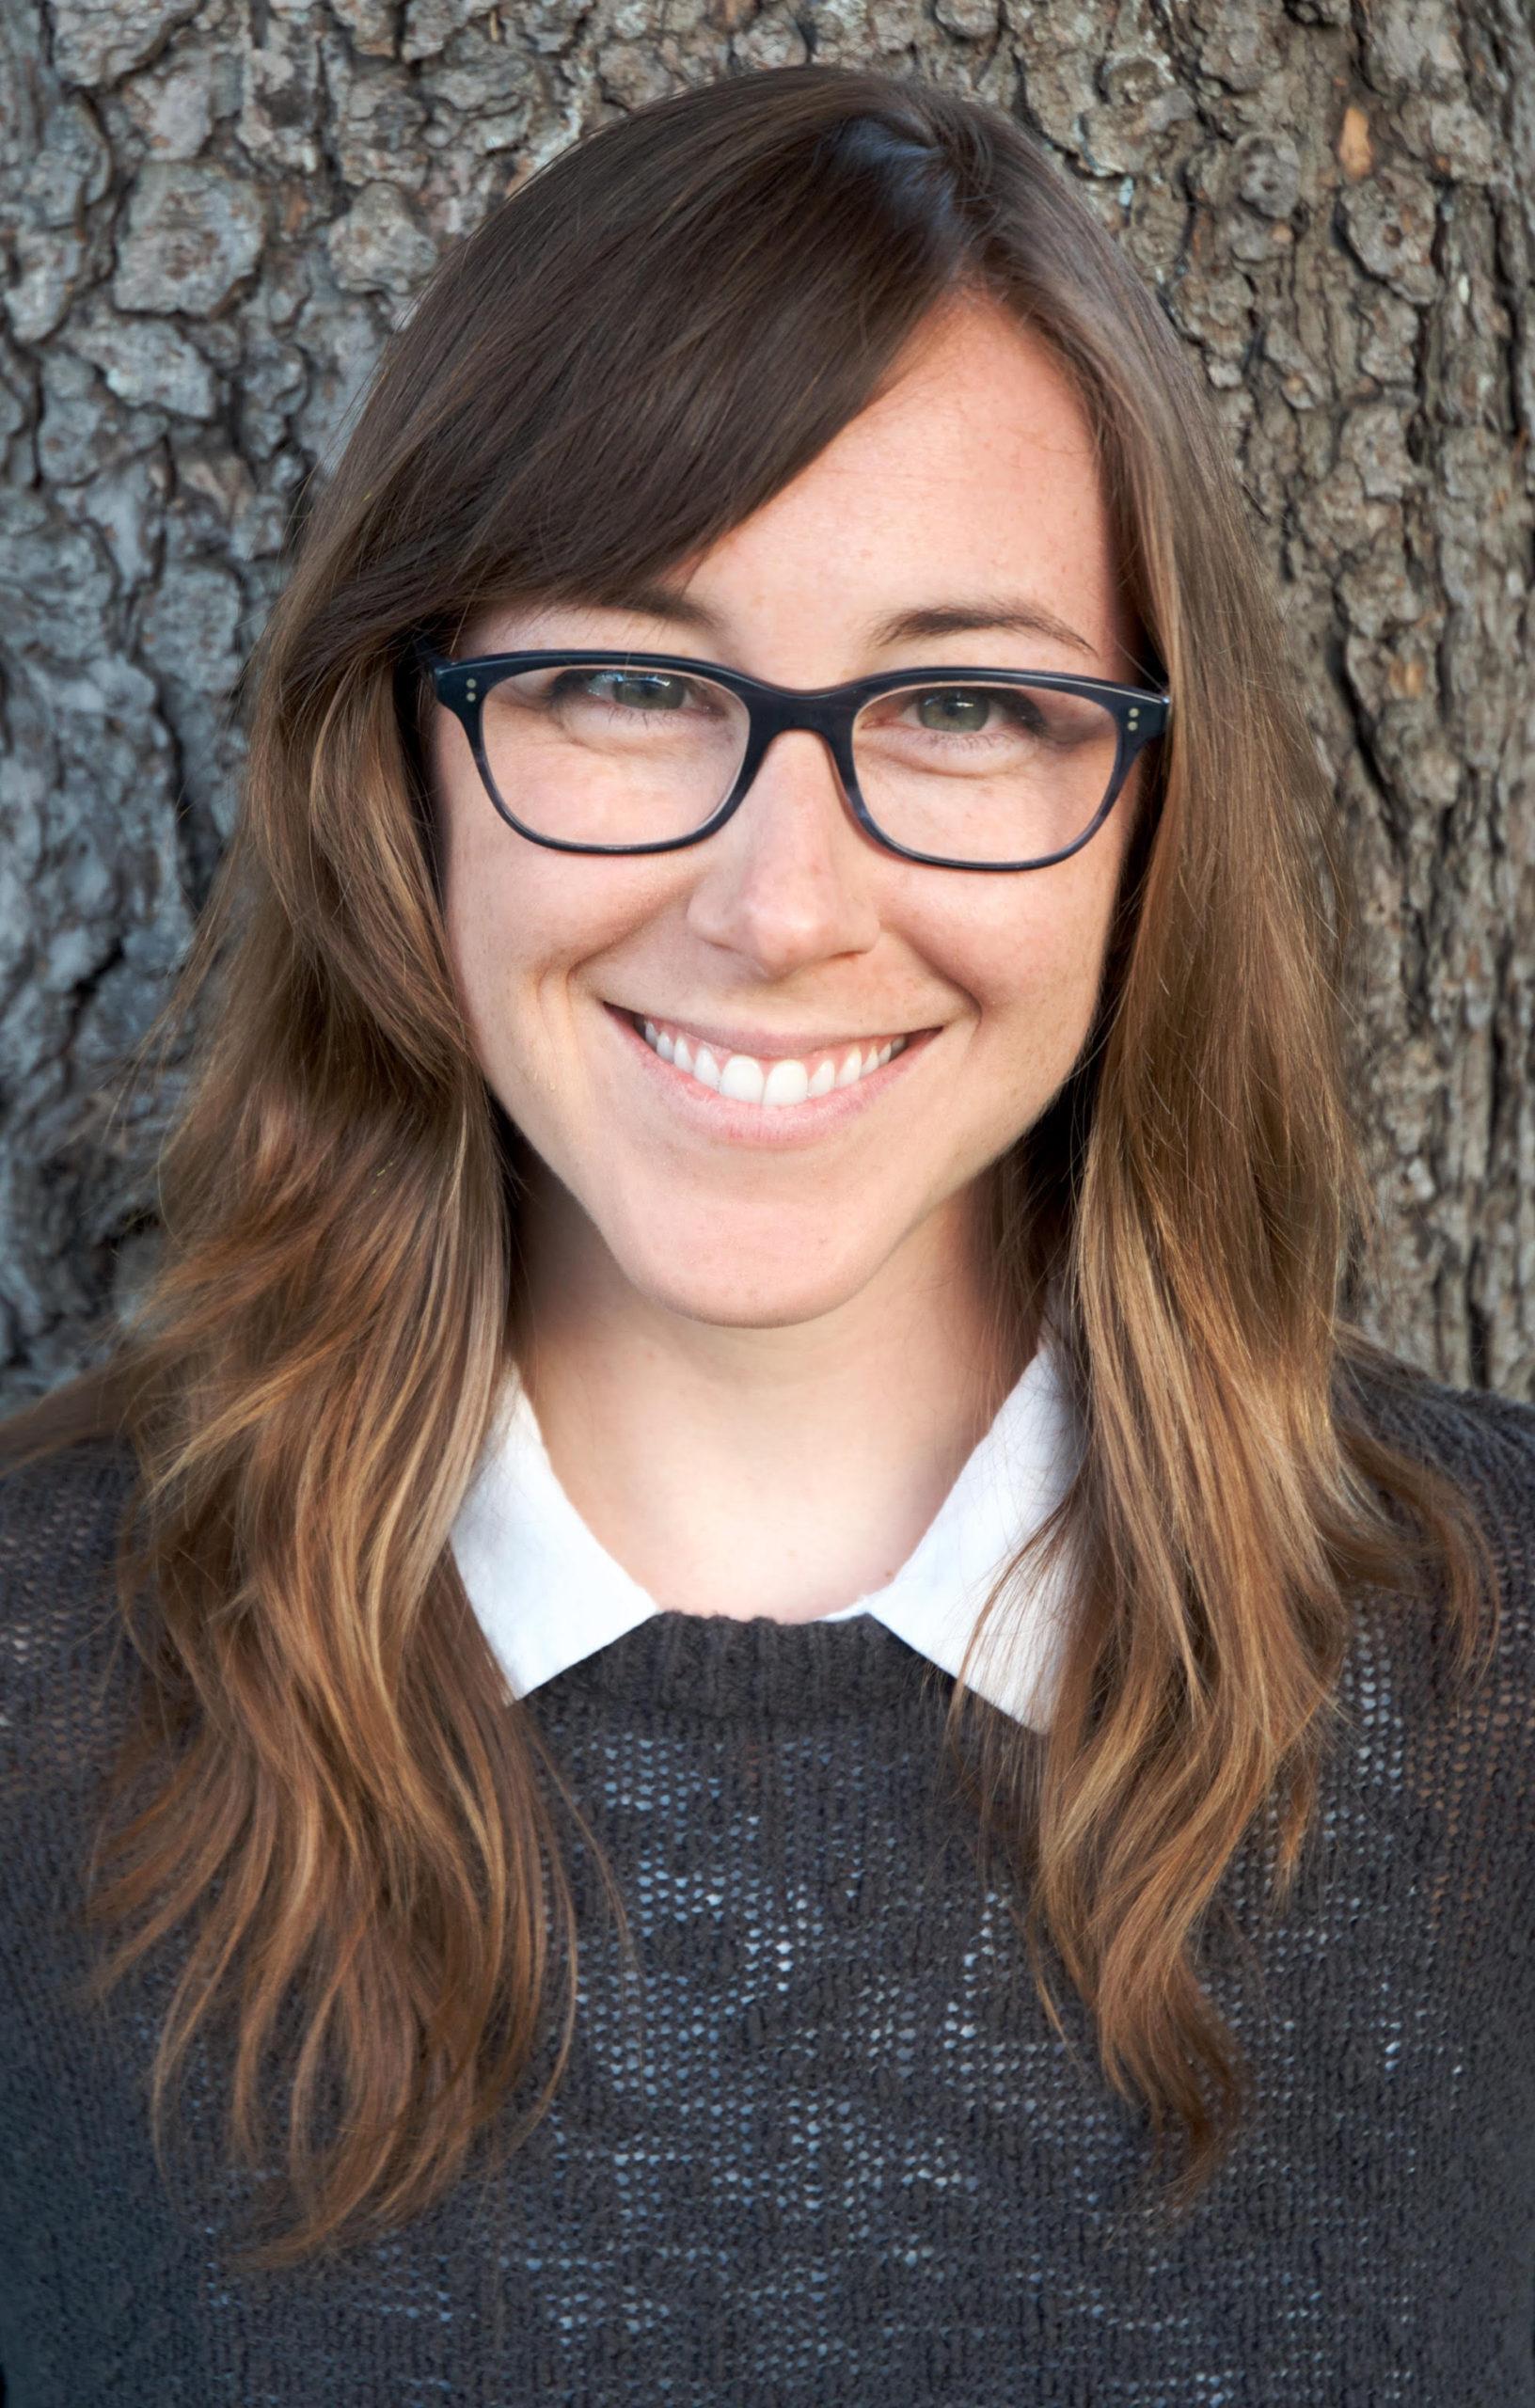 Q&A: Alexa Eisenberg focuses on making housing policy better